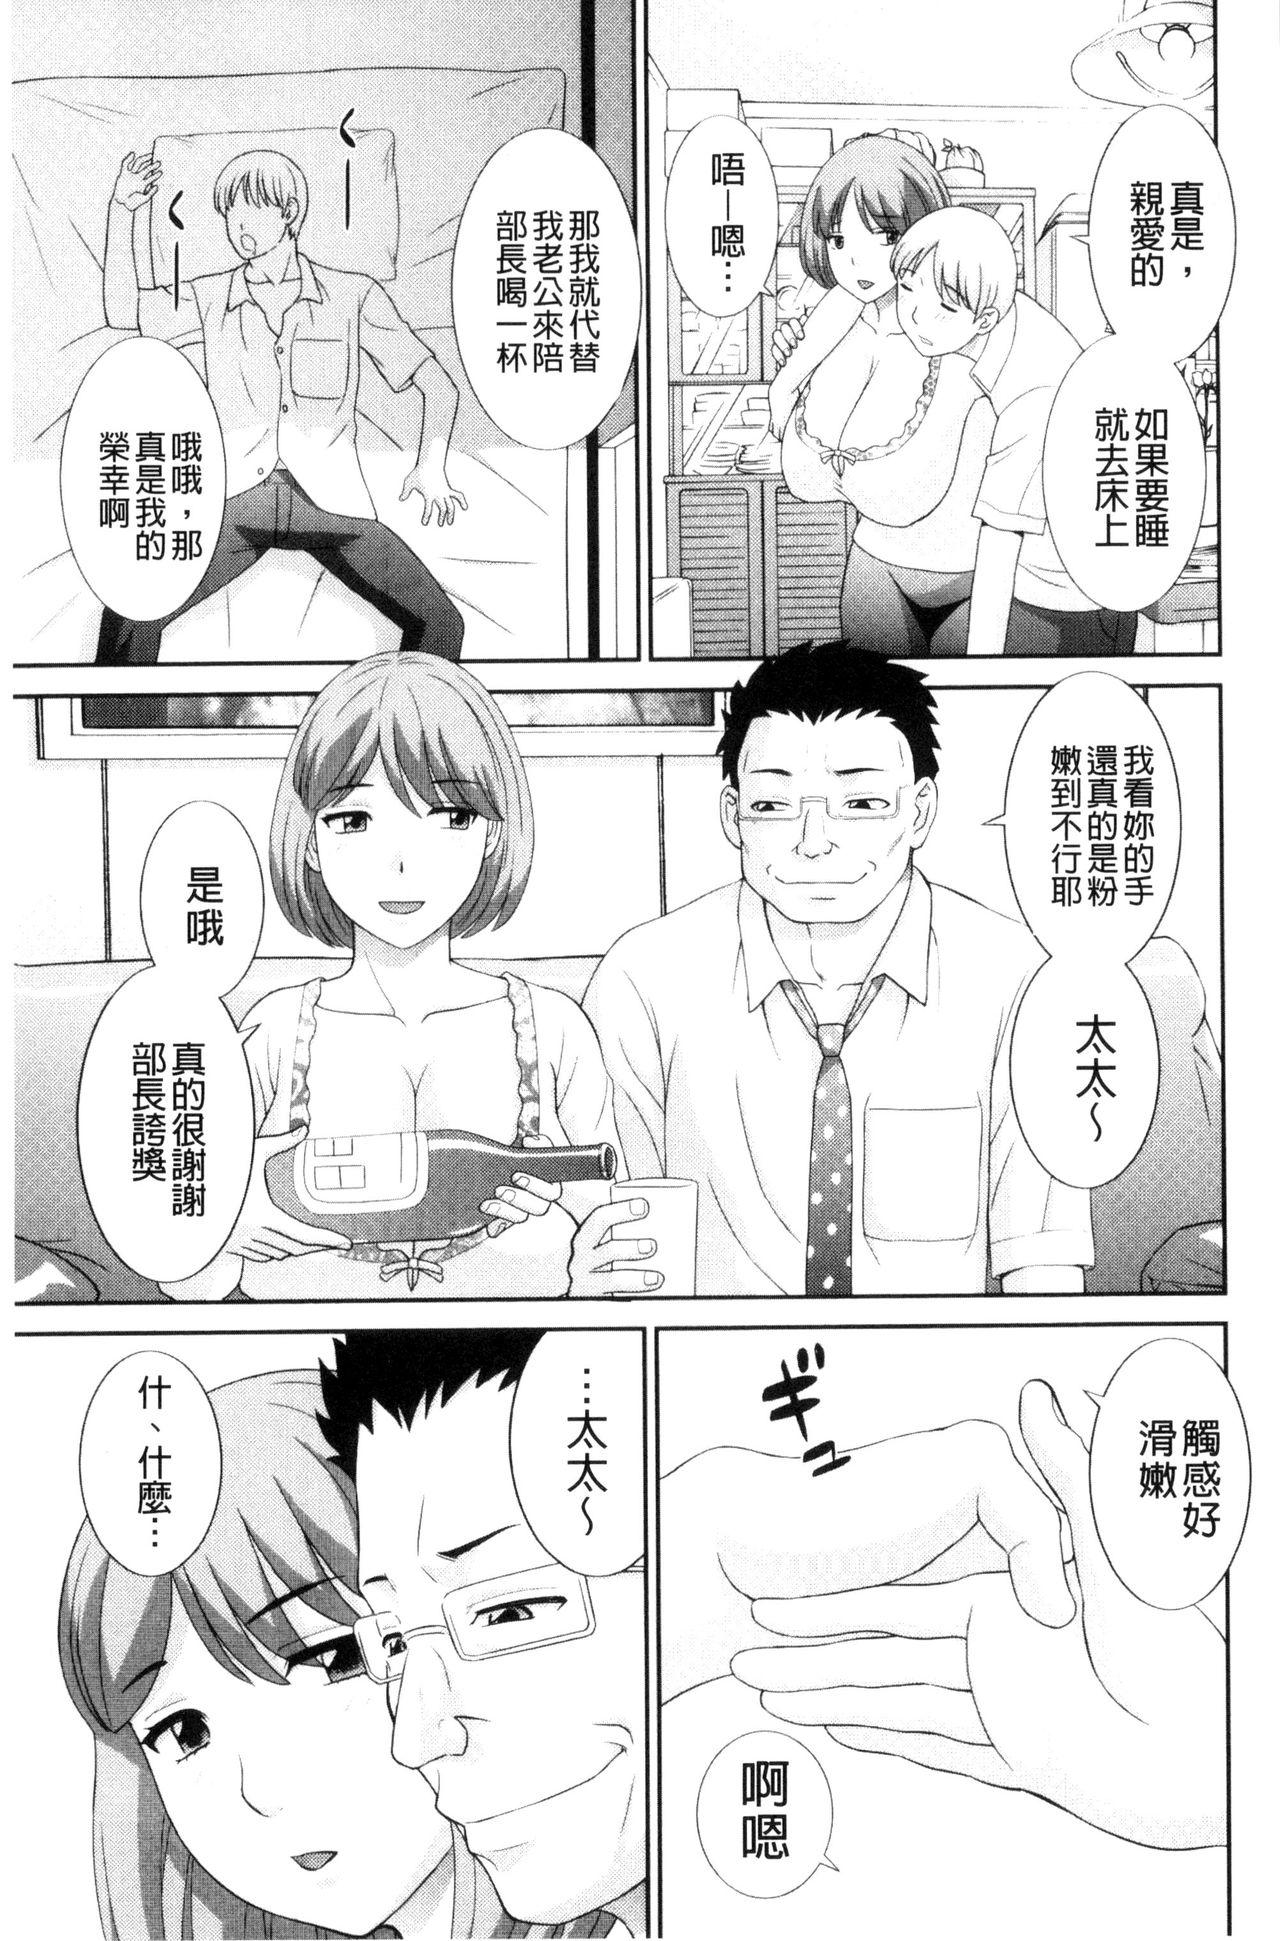 Haramase! Hitozuma Choukyoushi | 受孕吧!人妻調教師 44